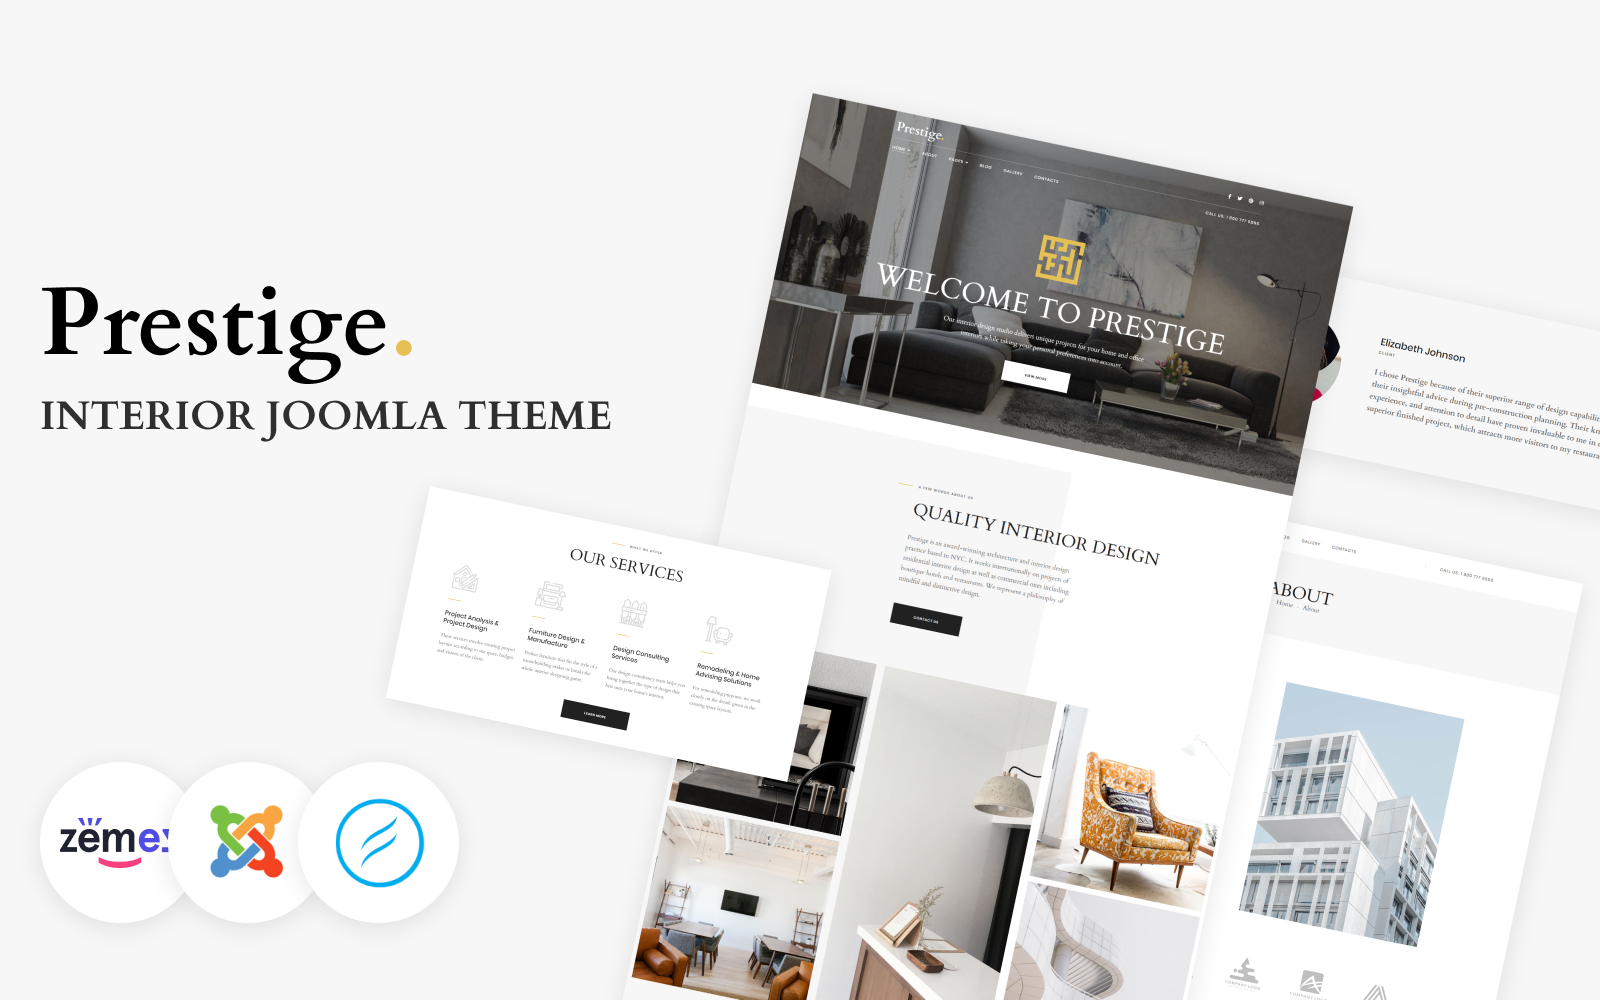 Prestige - Interior Design Multipage Template Joomla №102715